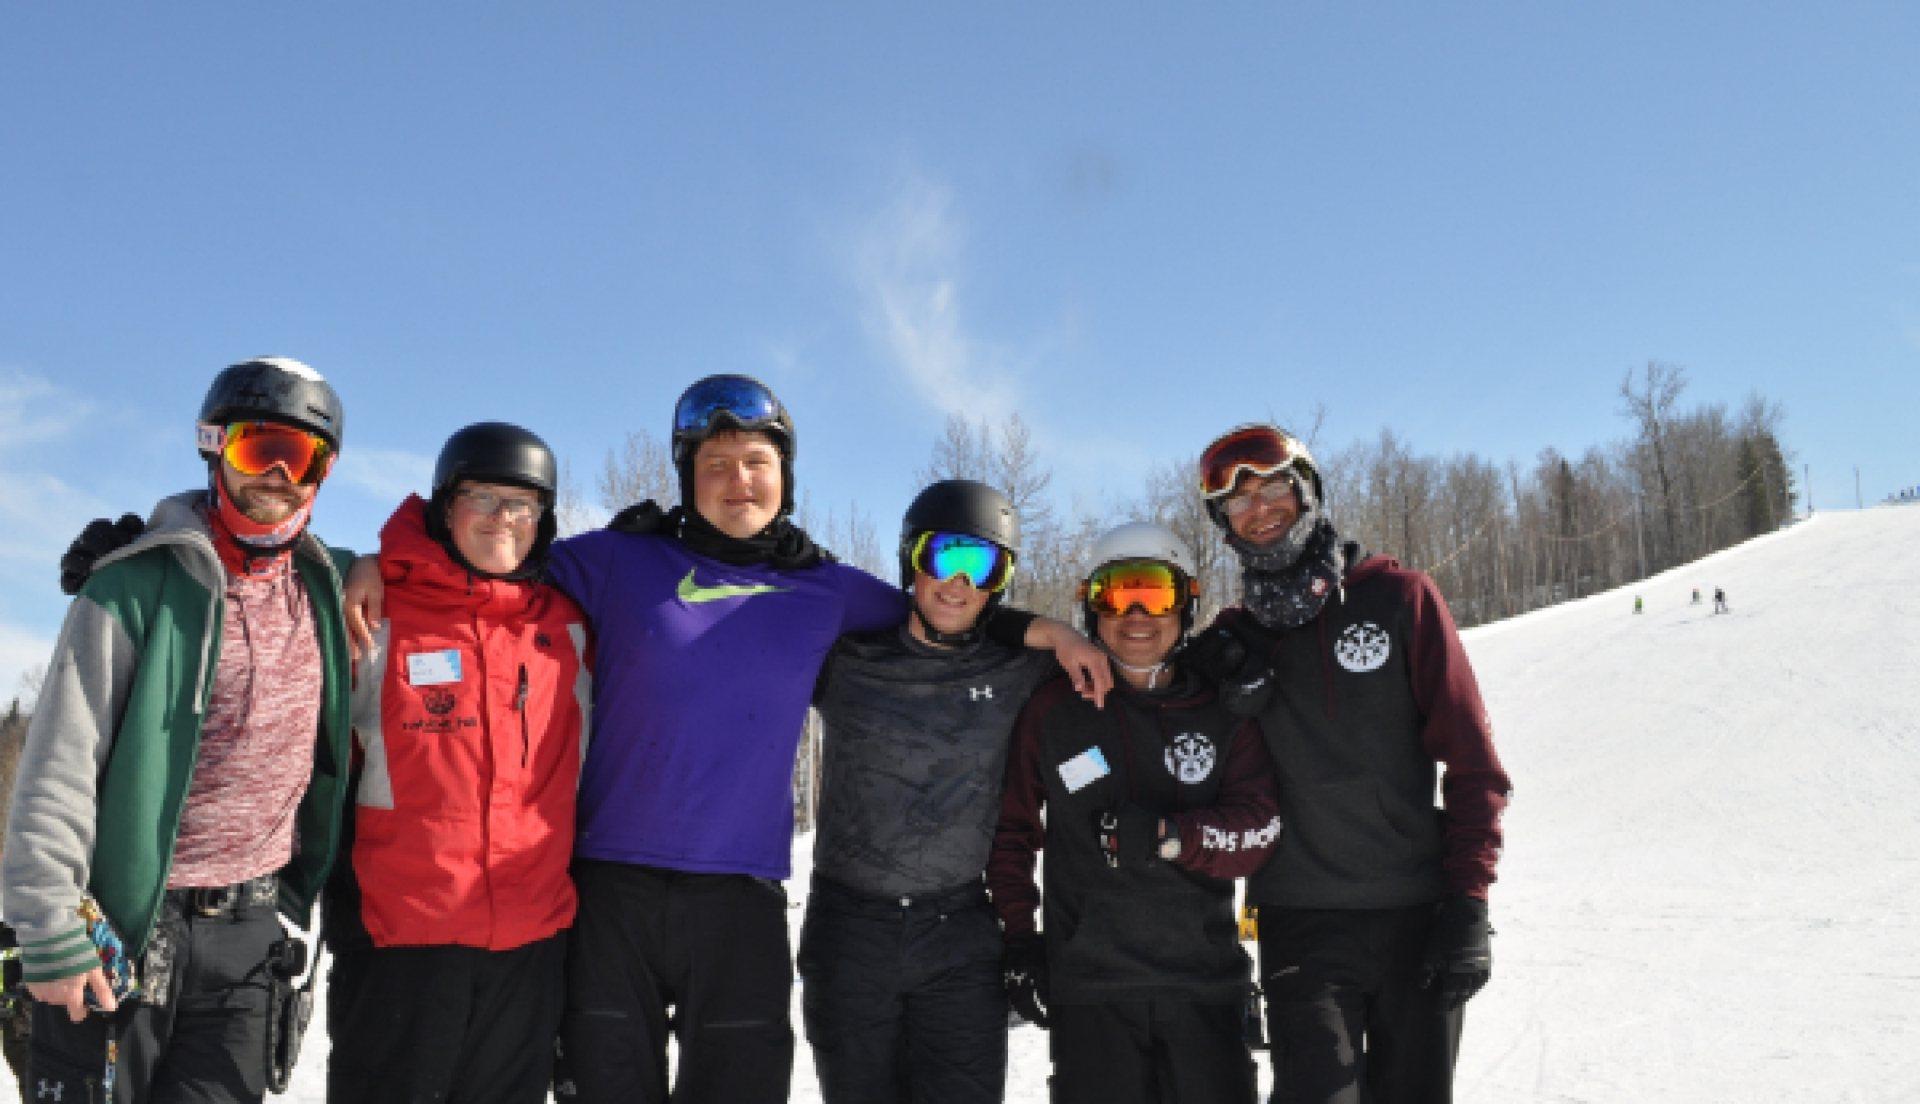 skiing, snowboarding, snowboarding lesson,  ski lessons, edmonton ski, edmonton sport, edmonton snowboard, winter fun, embrace winter, group lesson bundles